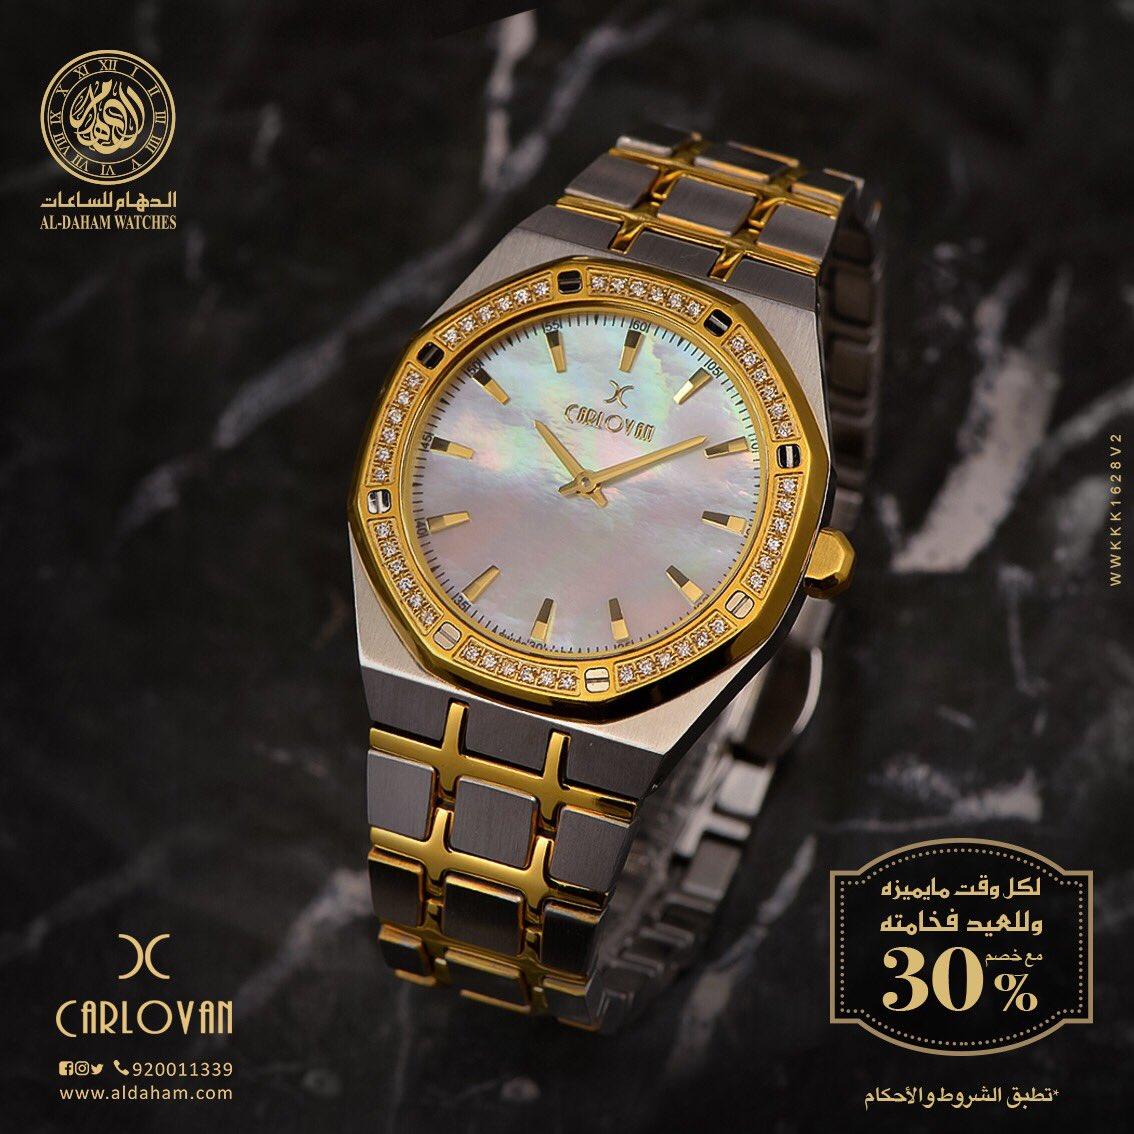 5d2d43c60 أحدث الساعات مع خصم 30٪ على الوكالات الحصرية من  #الدهام_للساعاتpic.twitter.com/AZoqsFe1mK